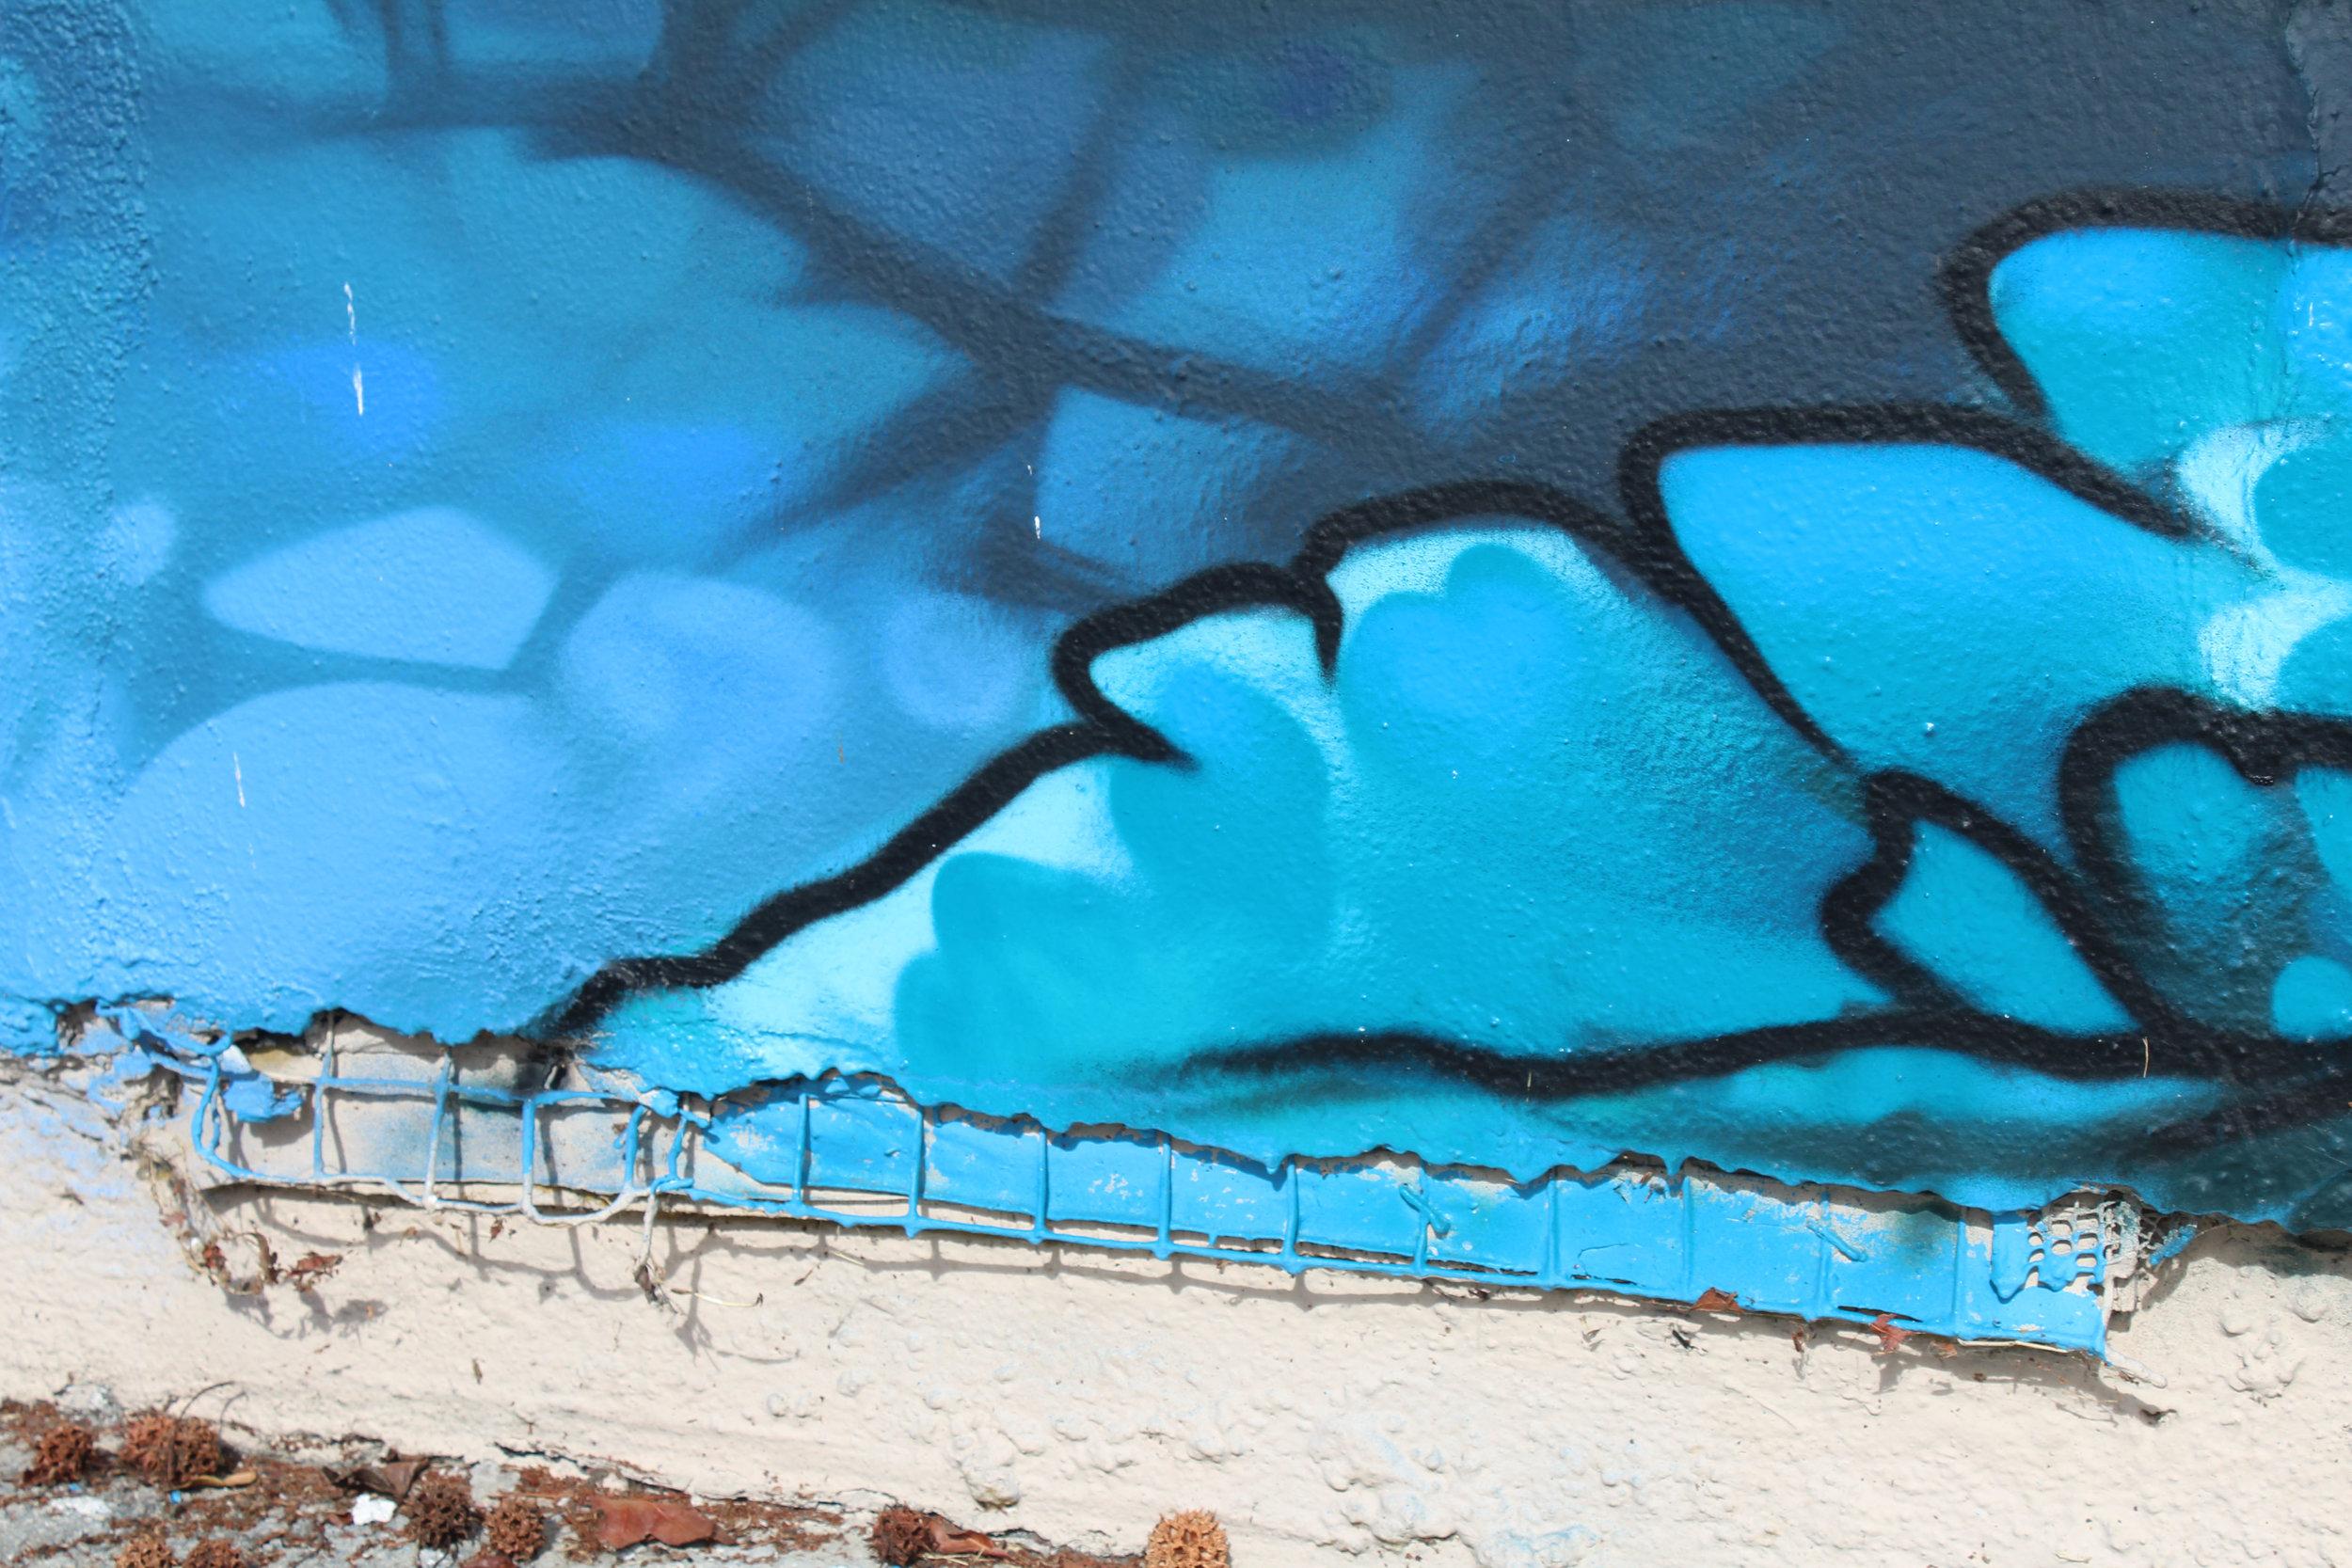 Murals that show slight damage located on Pico Blvd in Santa Monica, Calif.